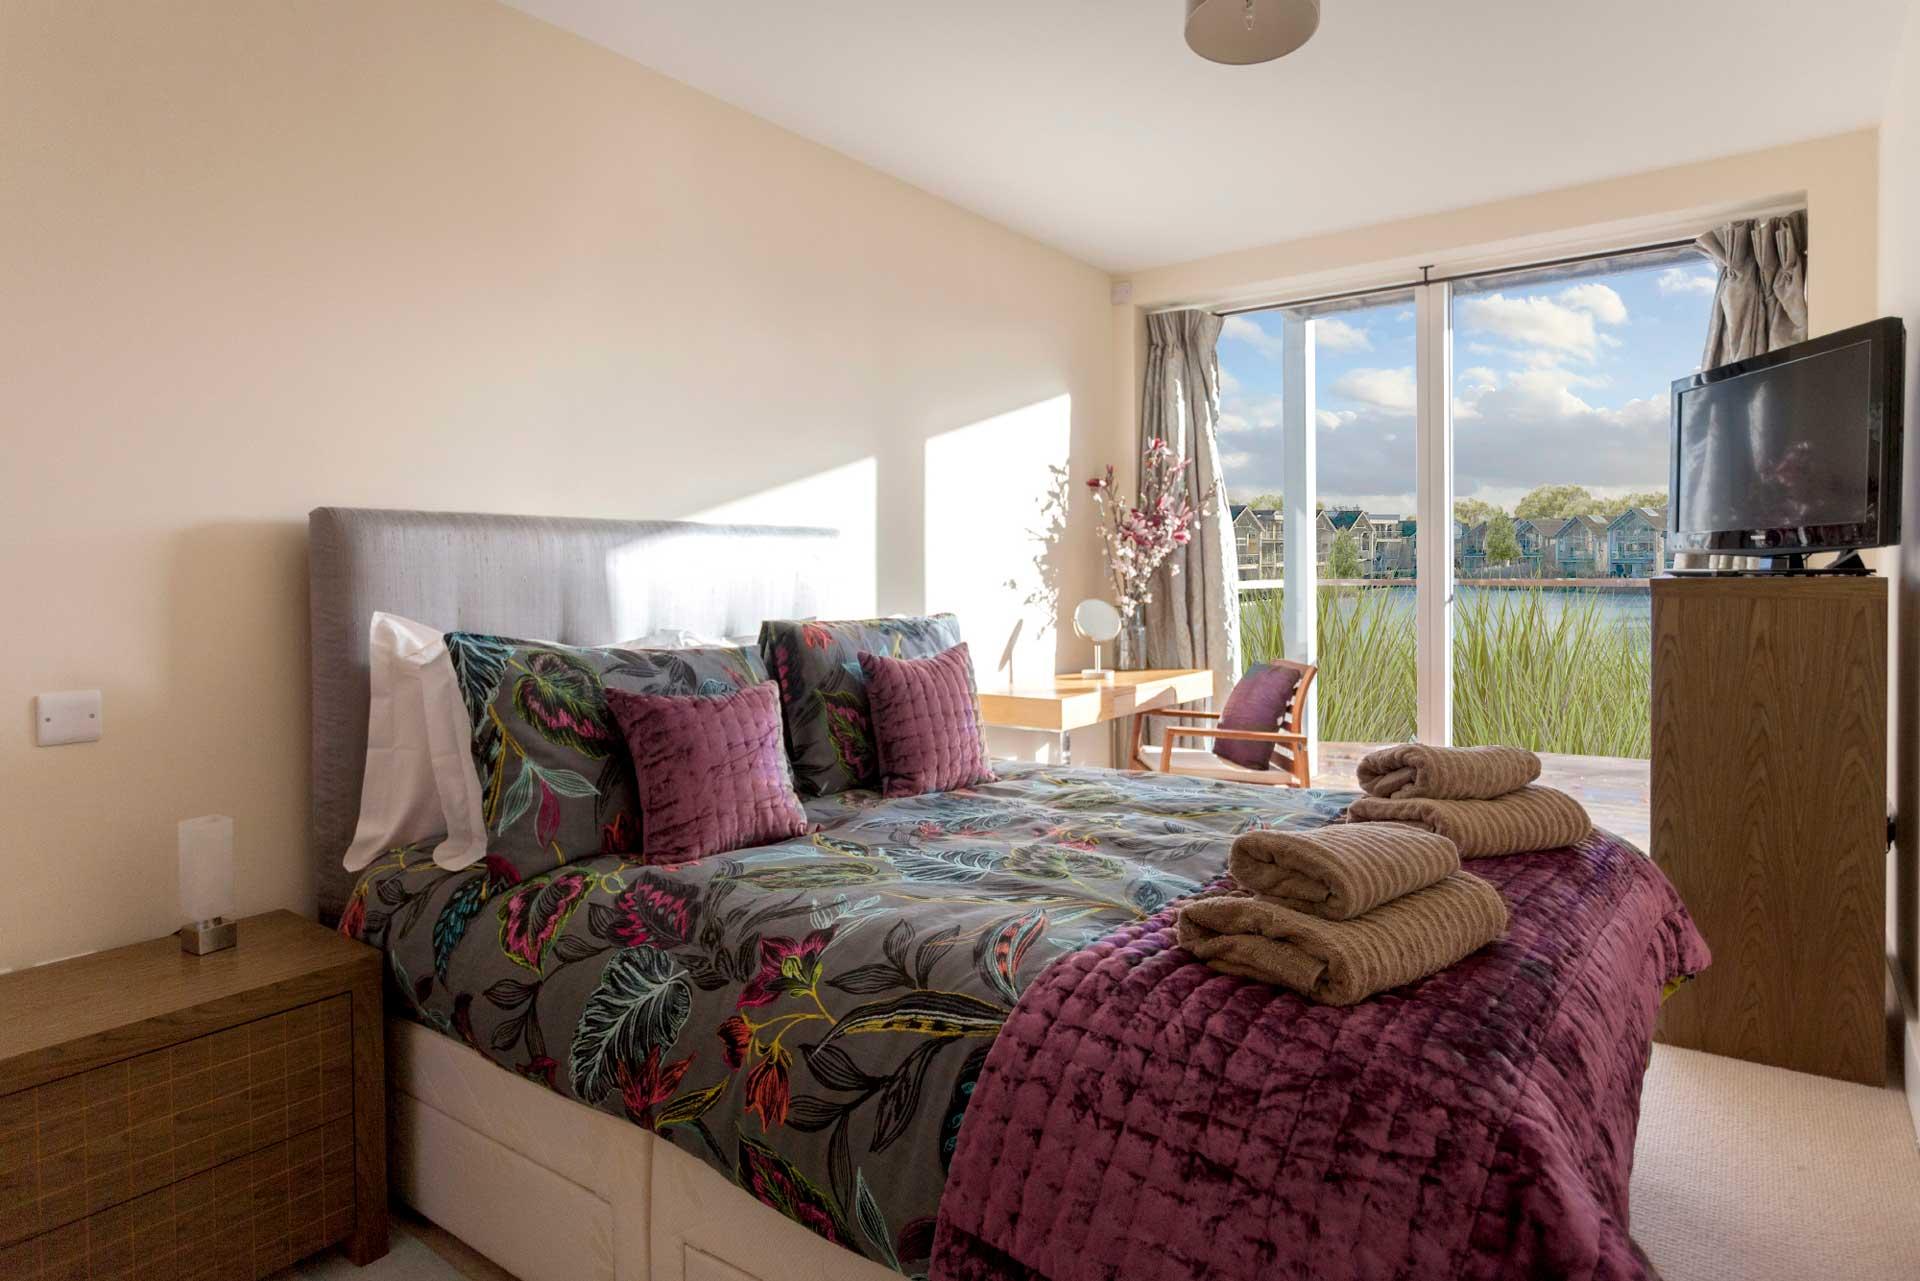 Howells-Mere-3-Lower-Mill-Estate-Rentals-Bedroom-1a